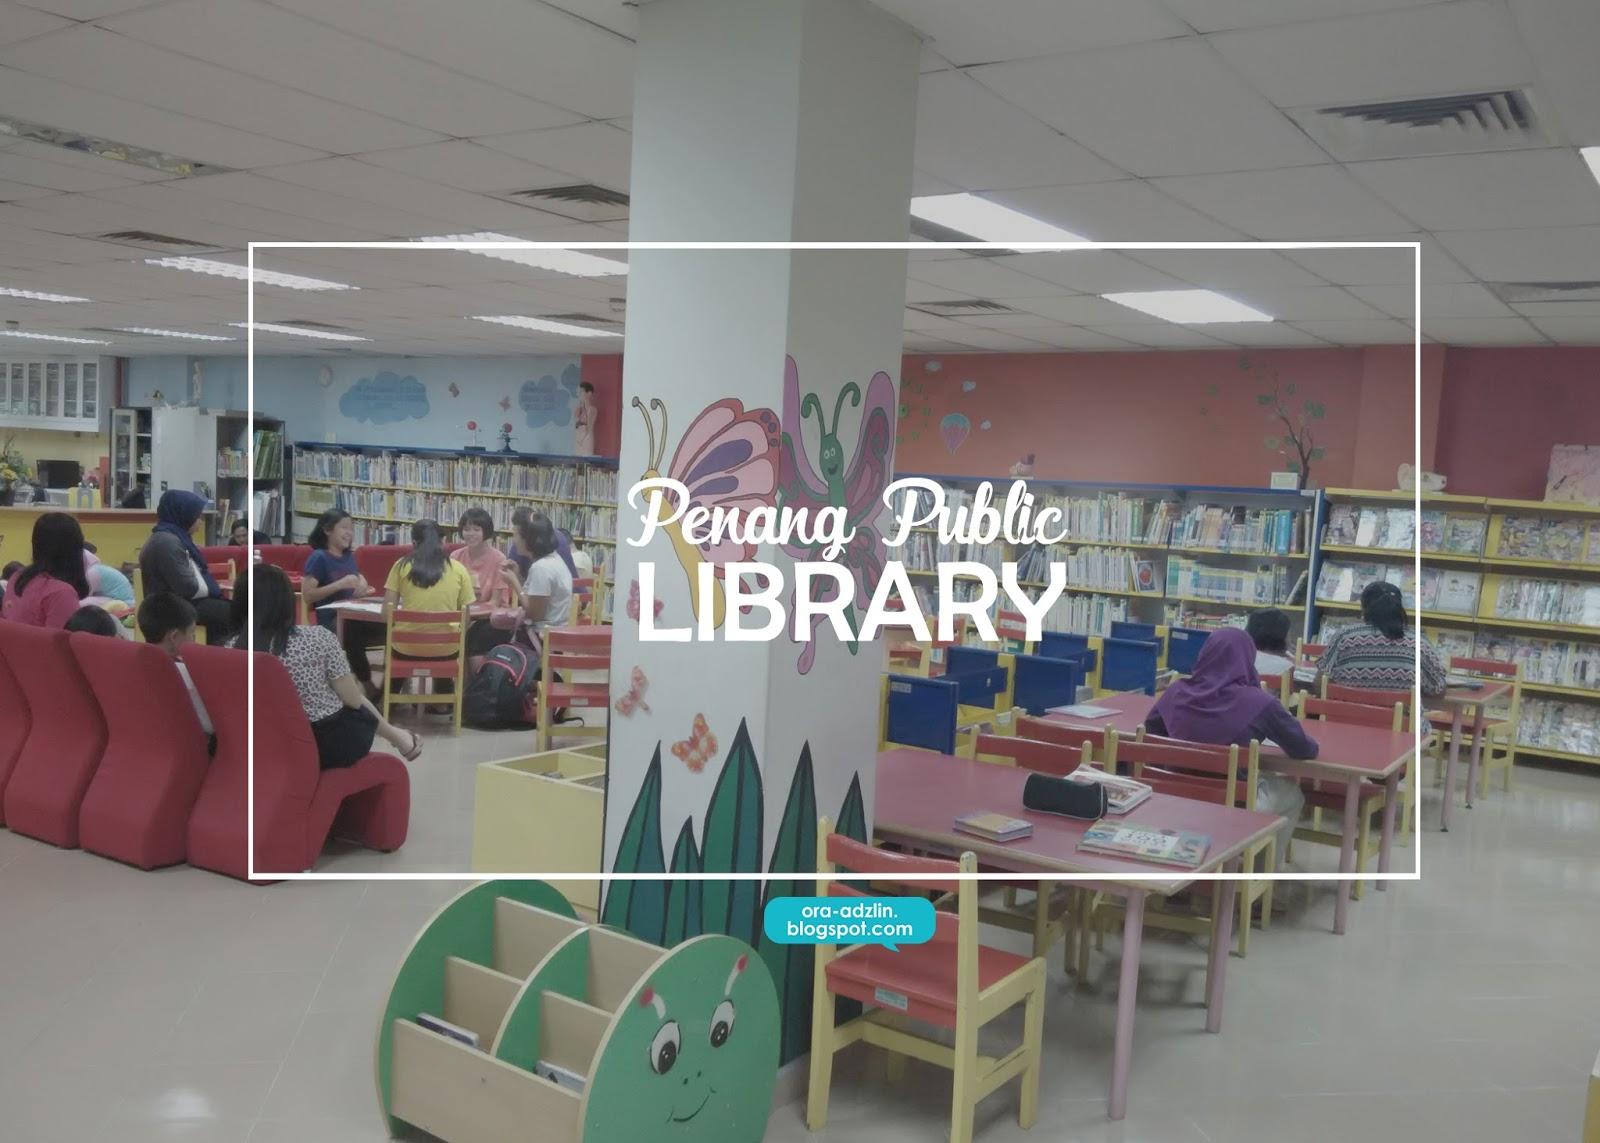 Penang Public Library Perbadanan Perpustakaan Awam Pulau Pinang Ora Yusuf Xandria